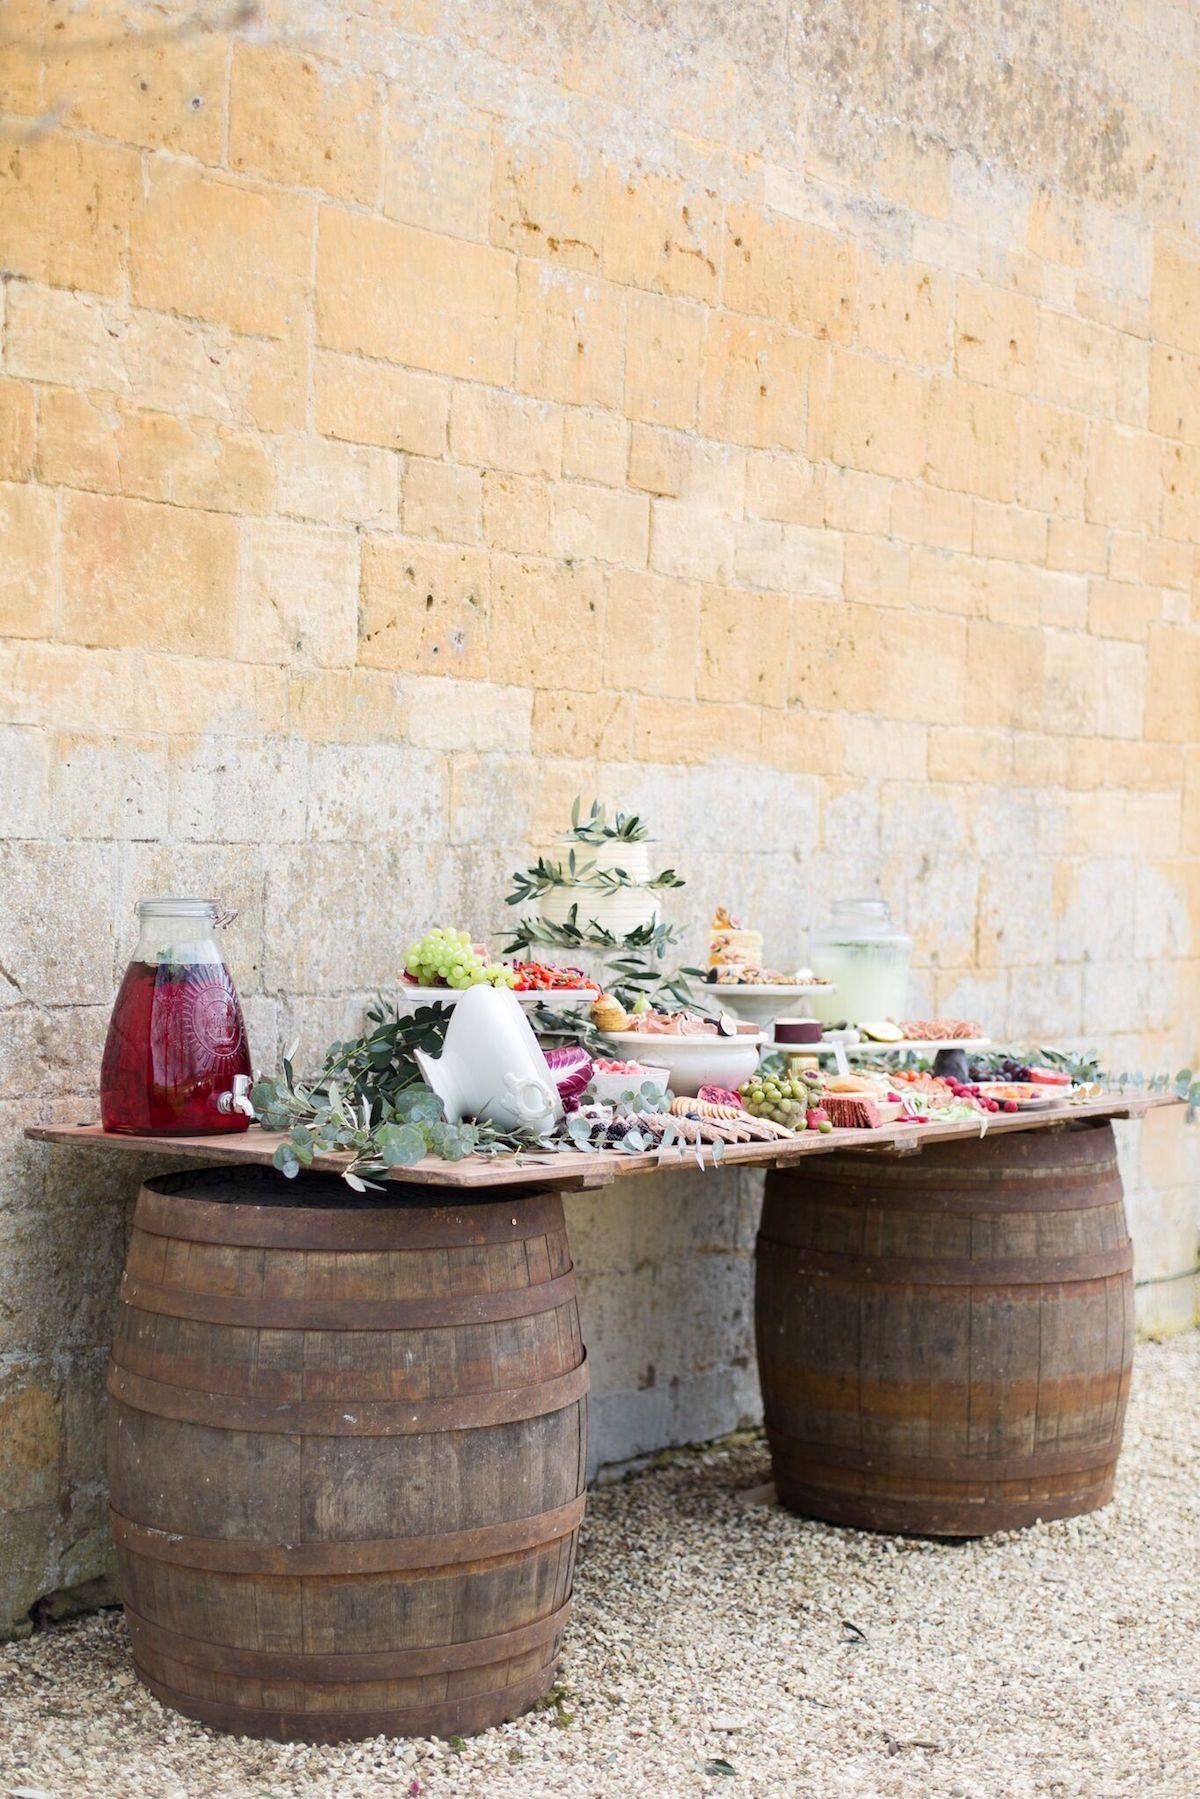 A Mediterranean Grazing Table for a Destination Wedding